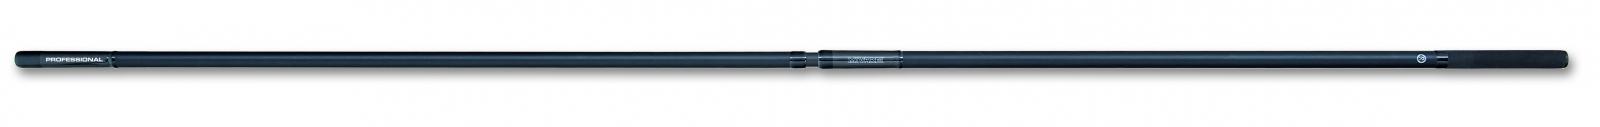 Podběrák Mivardi LevelM 90 x 90 cm + tyč Professional Twin